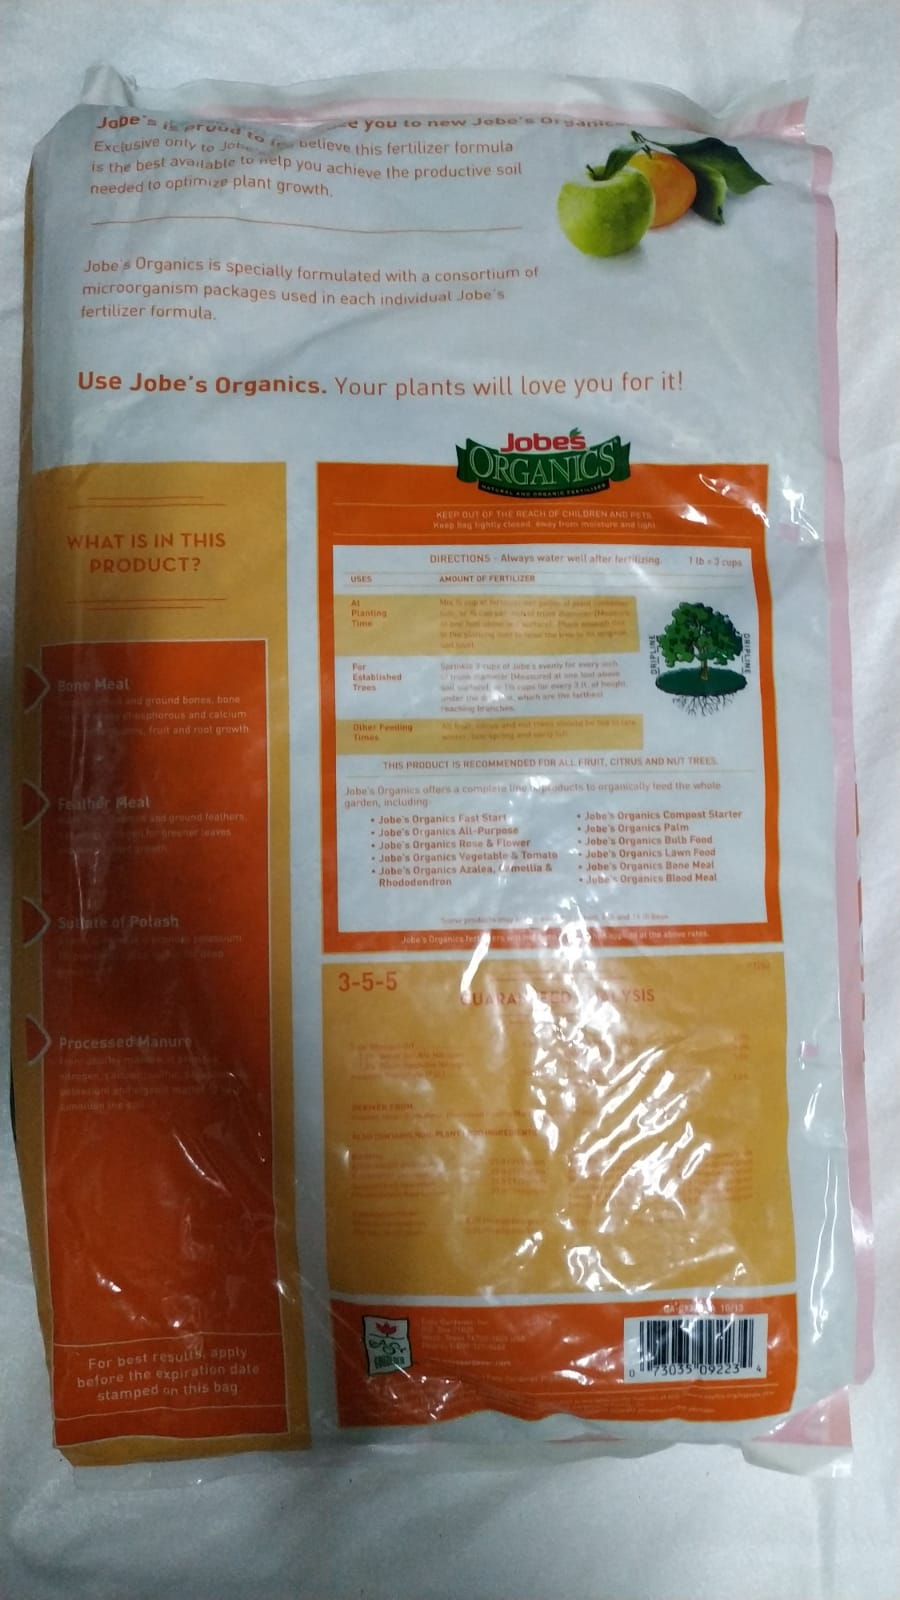 FRUIT & CITRUS GRANULAR Large Soil Fertilizer Pesticide Fertilizers